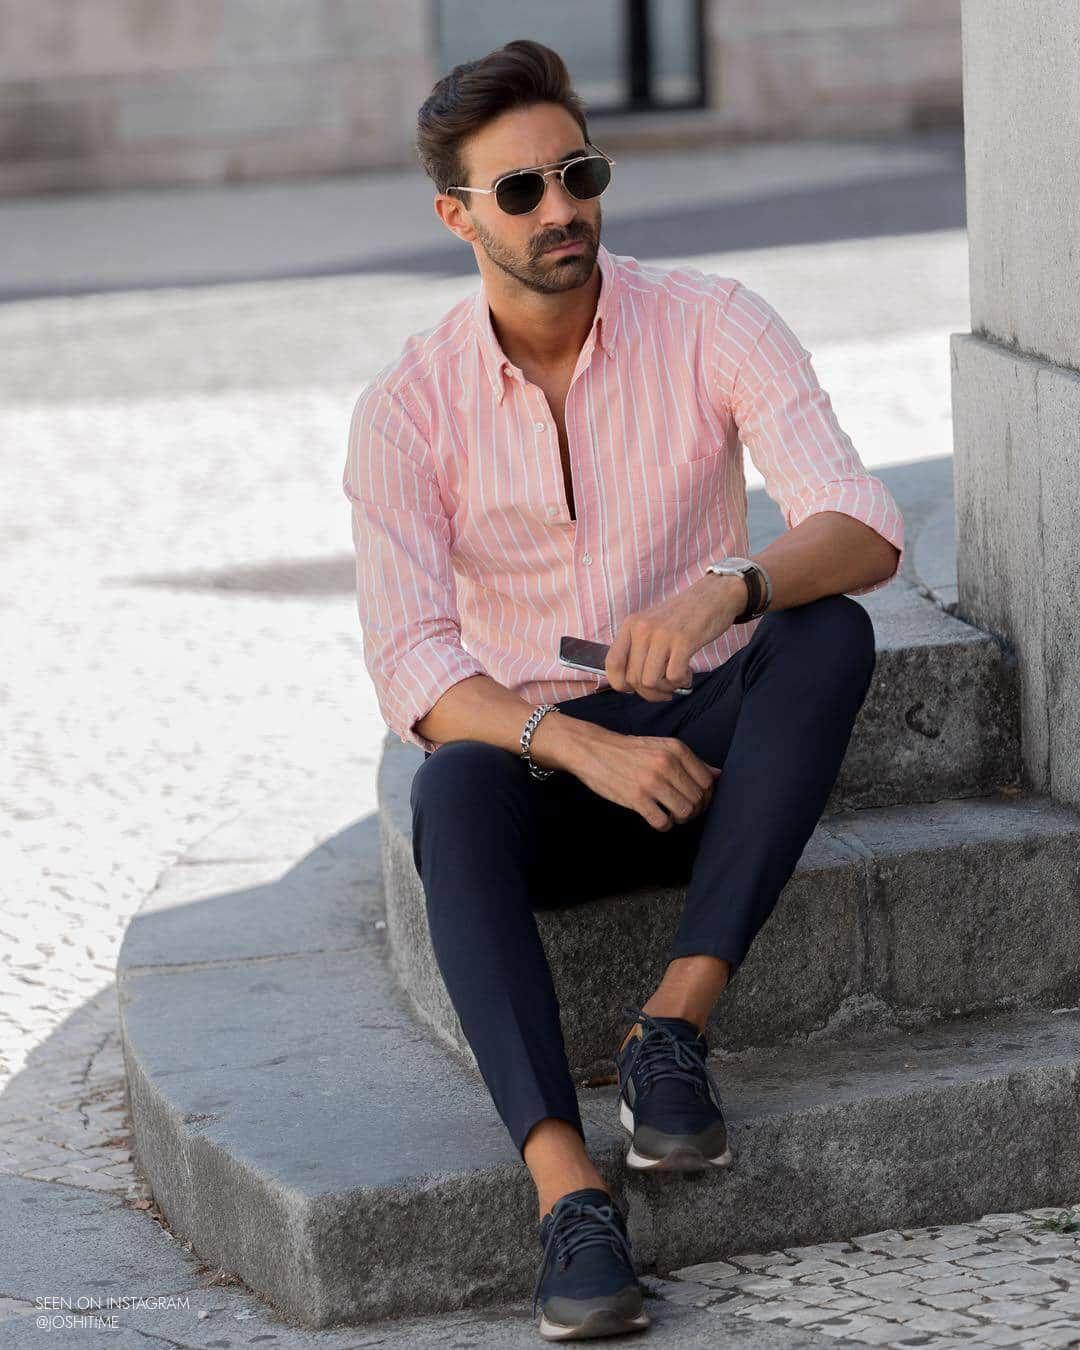 Männer sportlich-elegantes outfit Kleidungsstil Männer